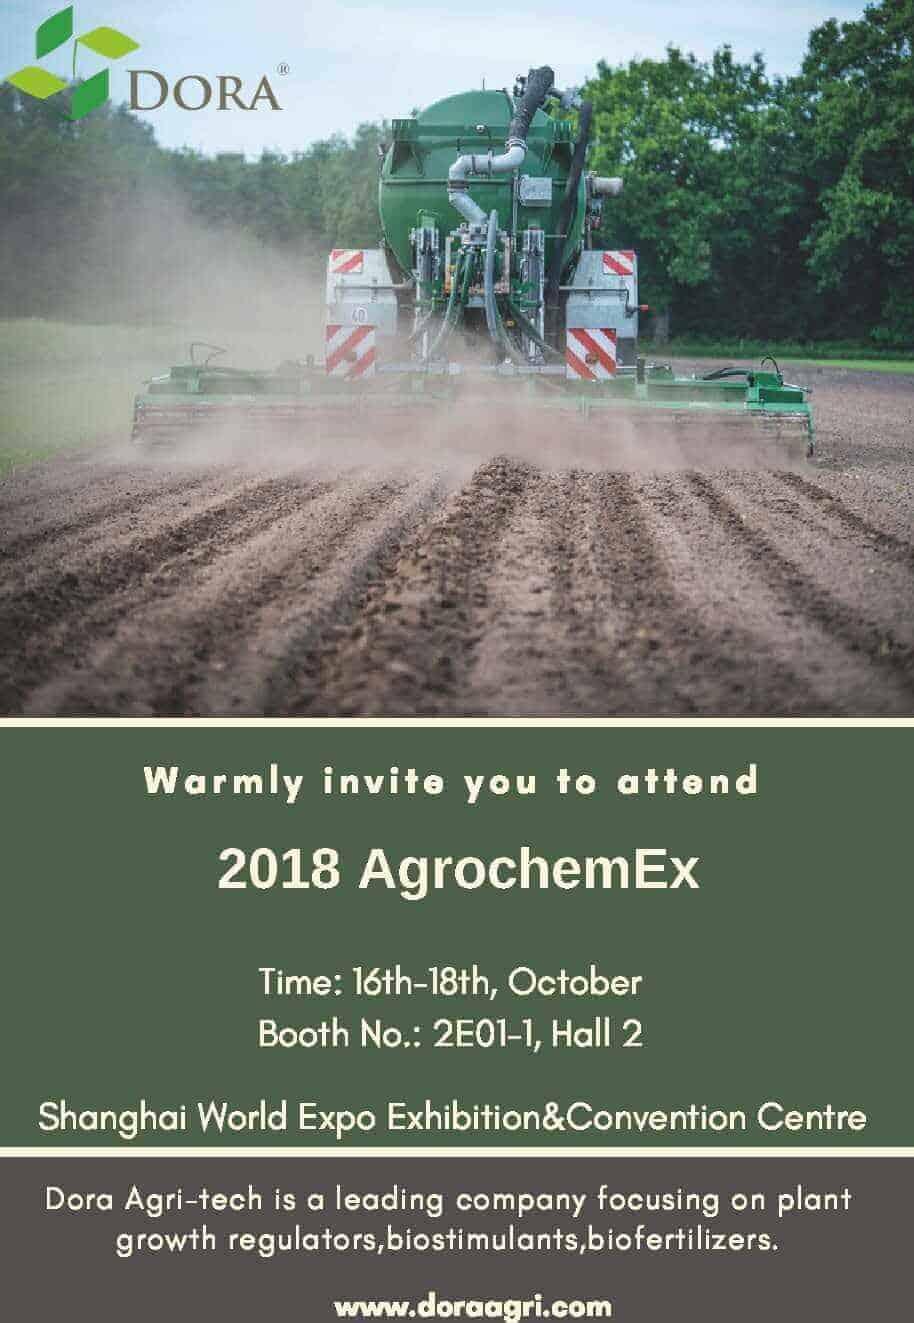 2018 AgrochemEx Shanghai